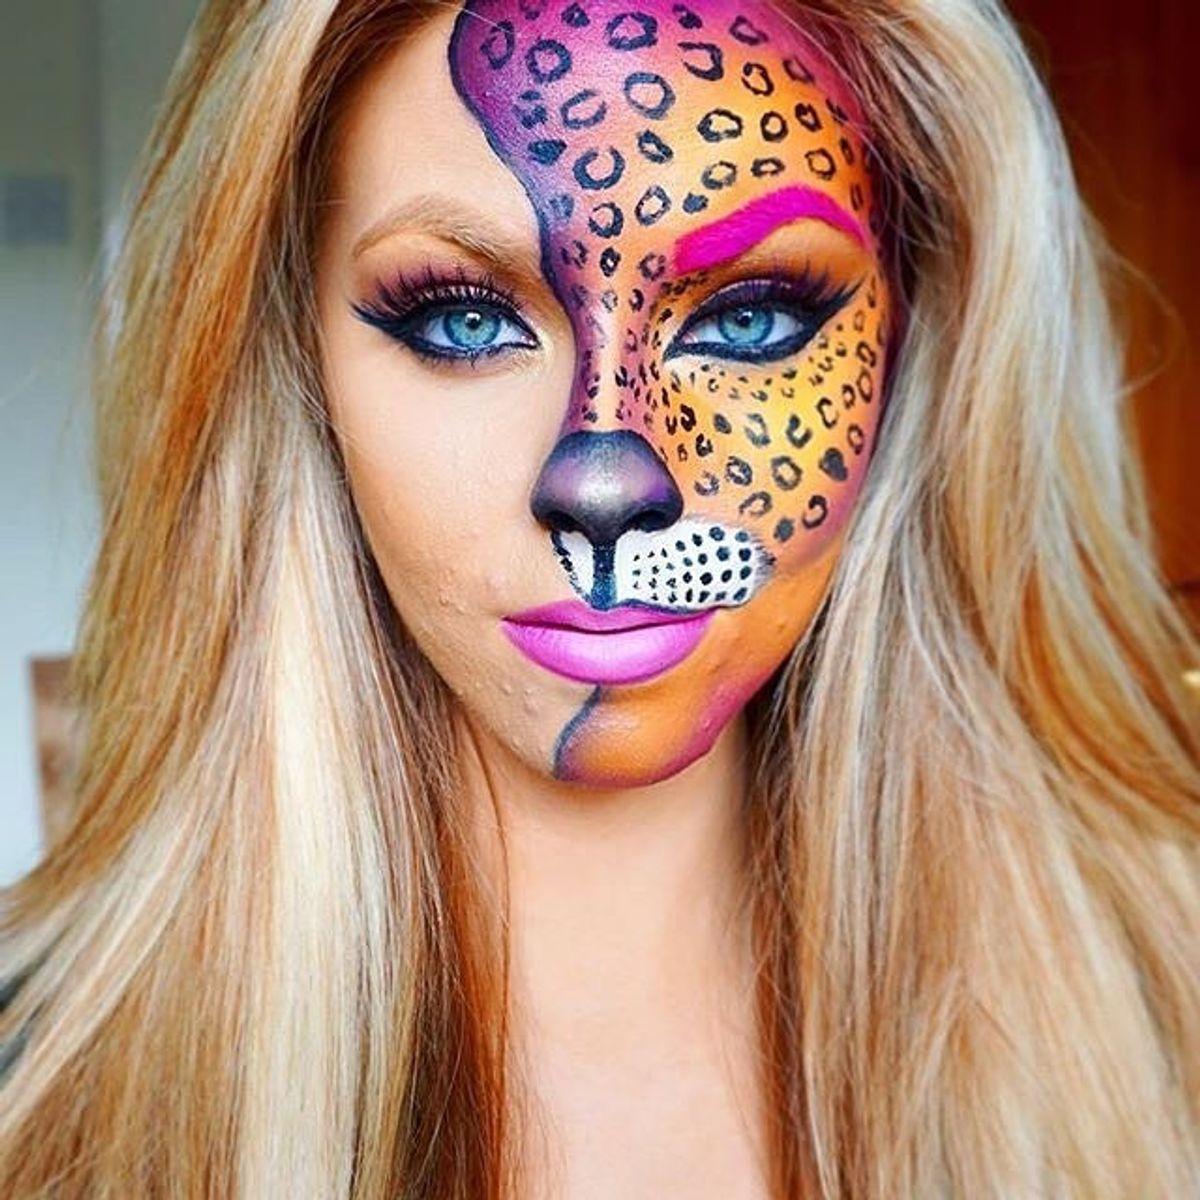 Lisa Frank: Back With A Makeup Line